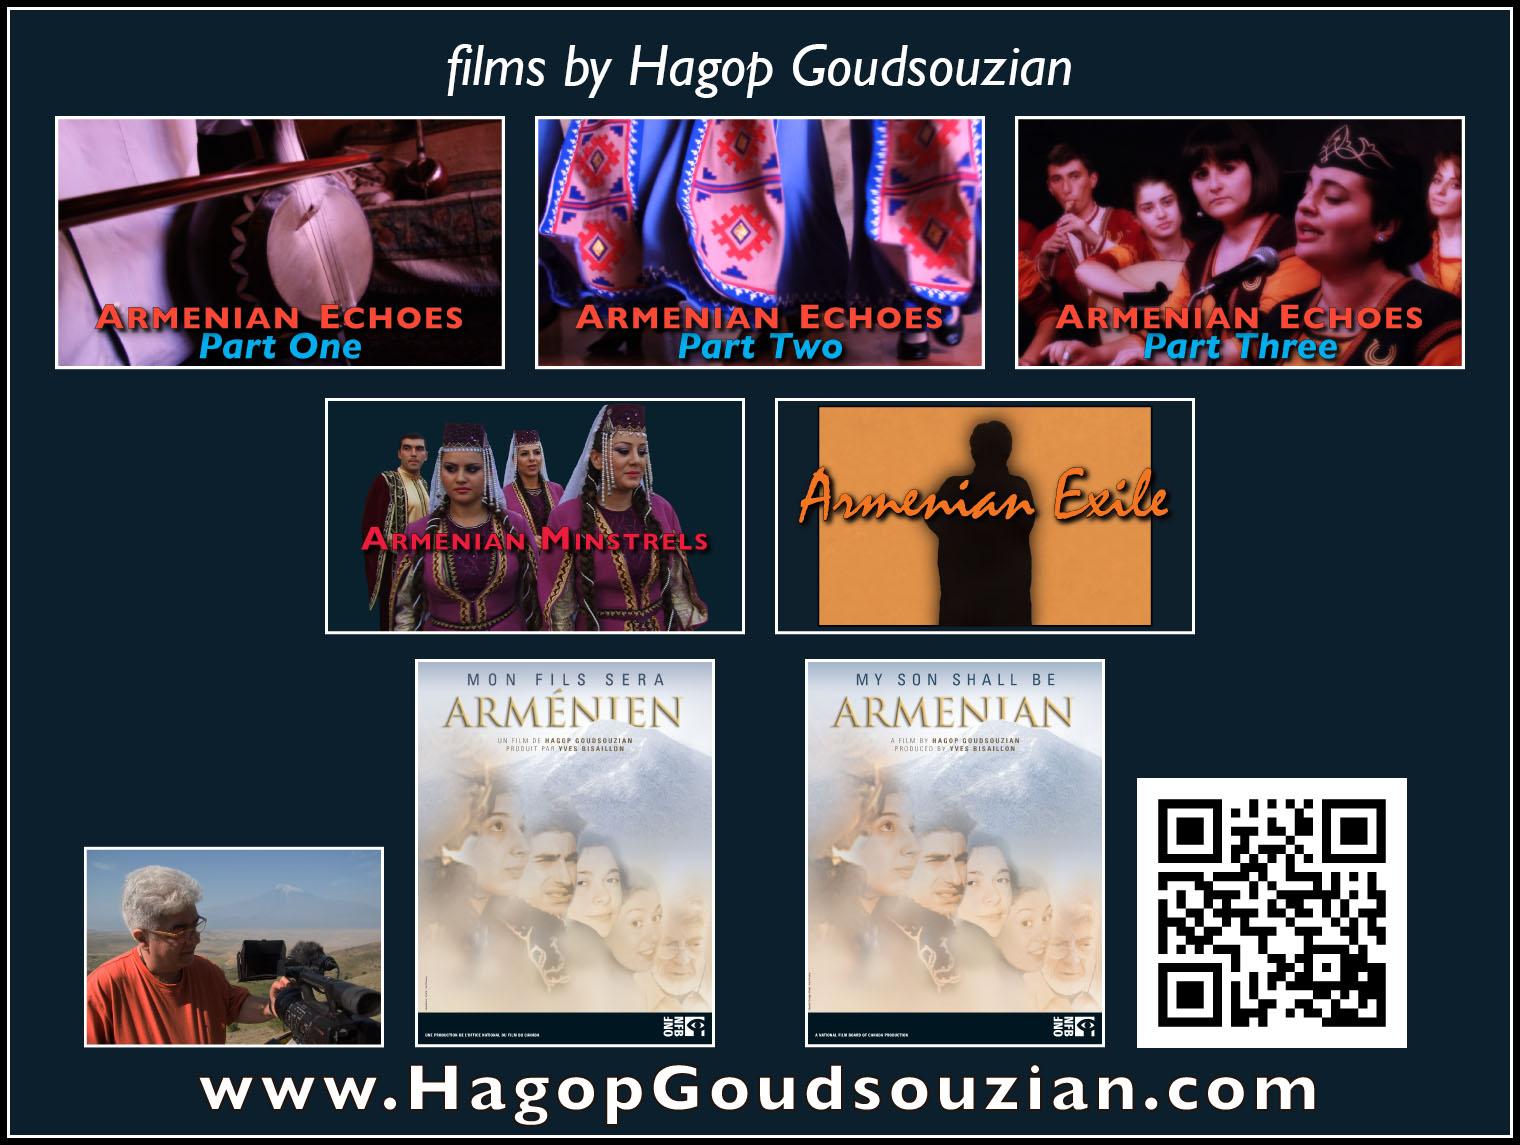 films by Hagop Goudsouzian